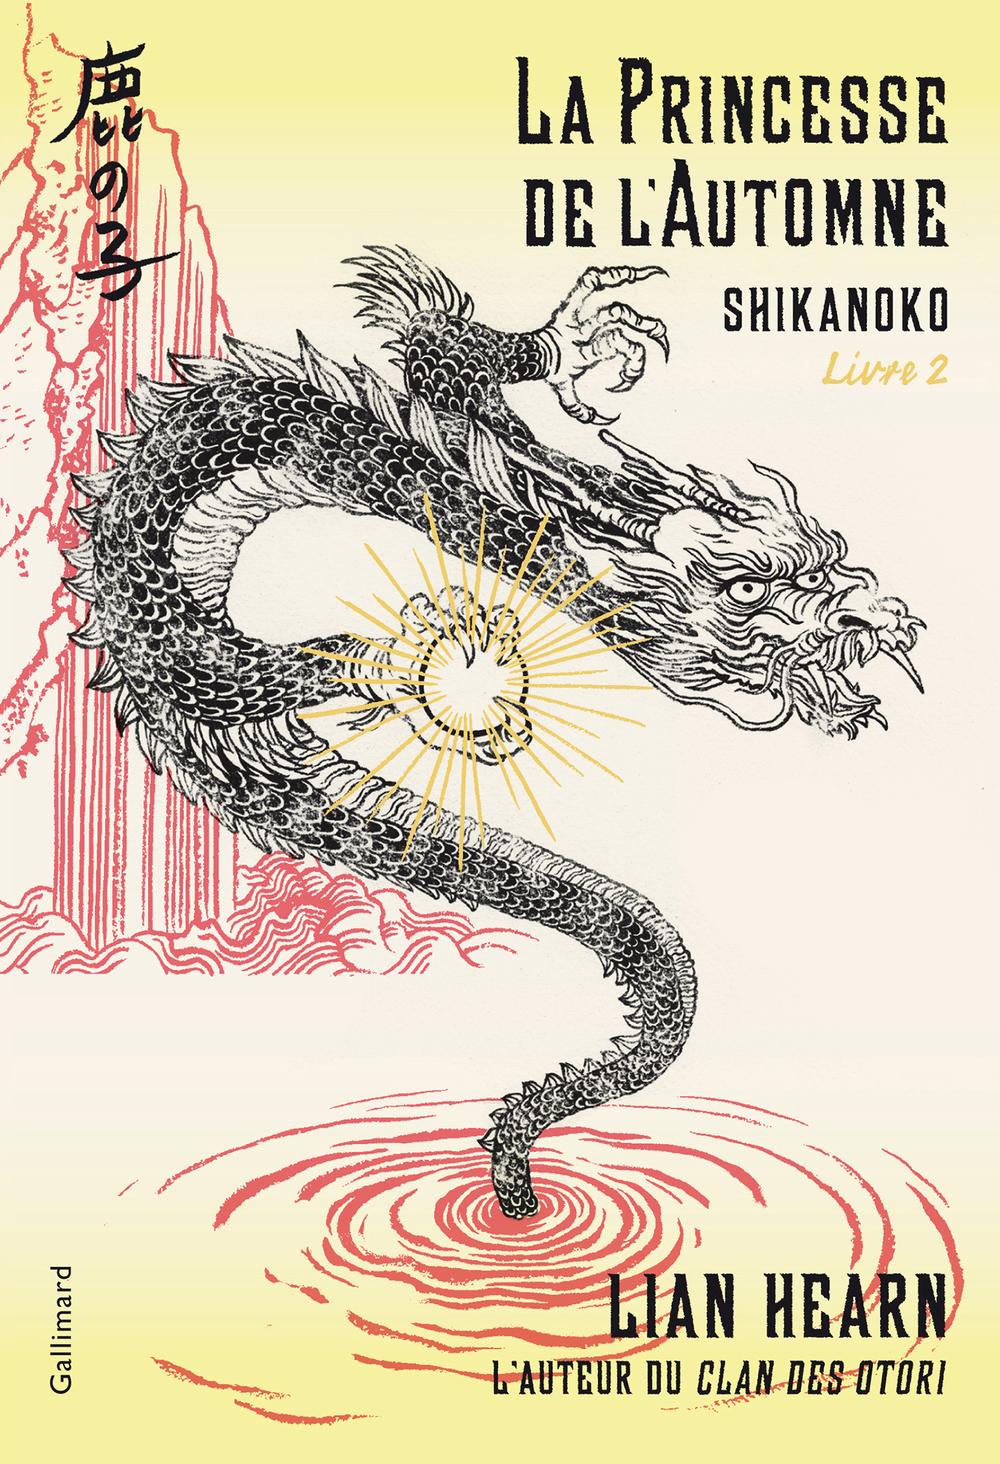 Shikanoko (Livre 2) - La Princesse de l'Automne |